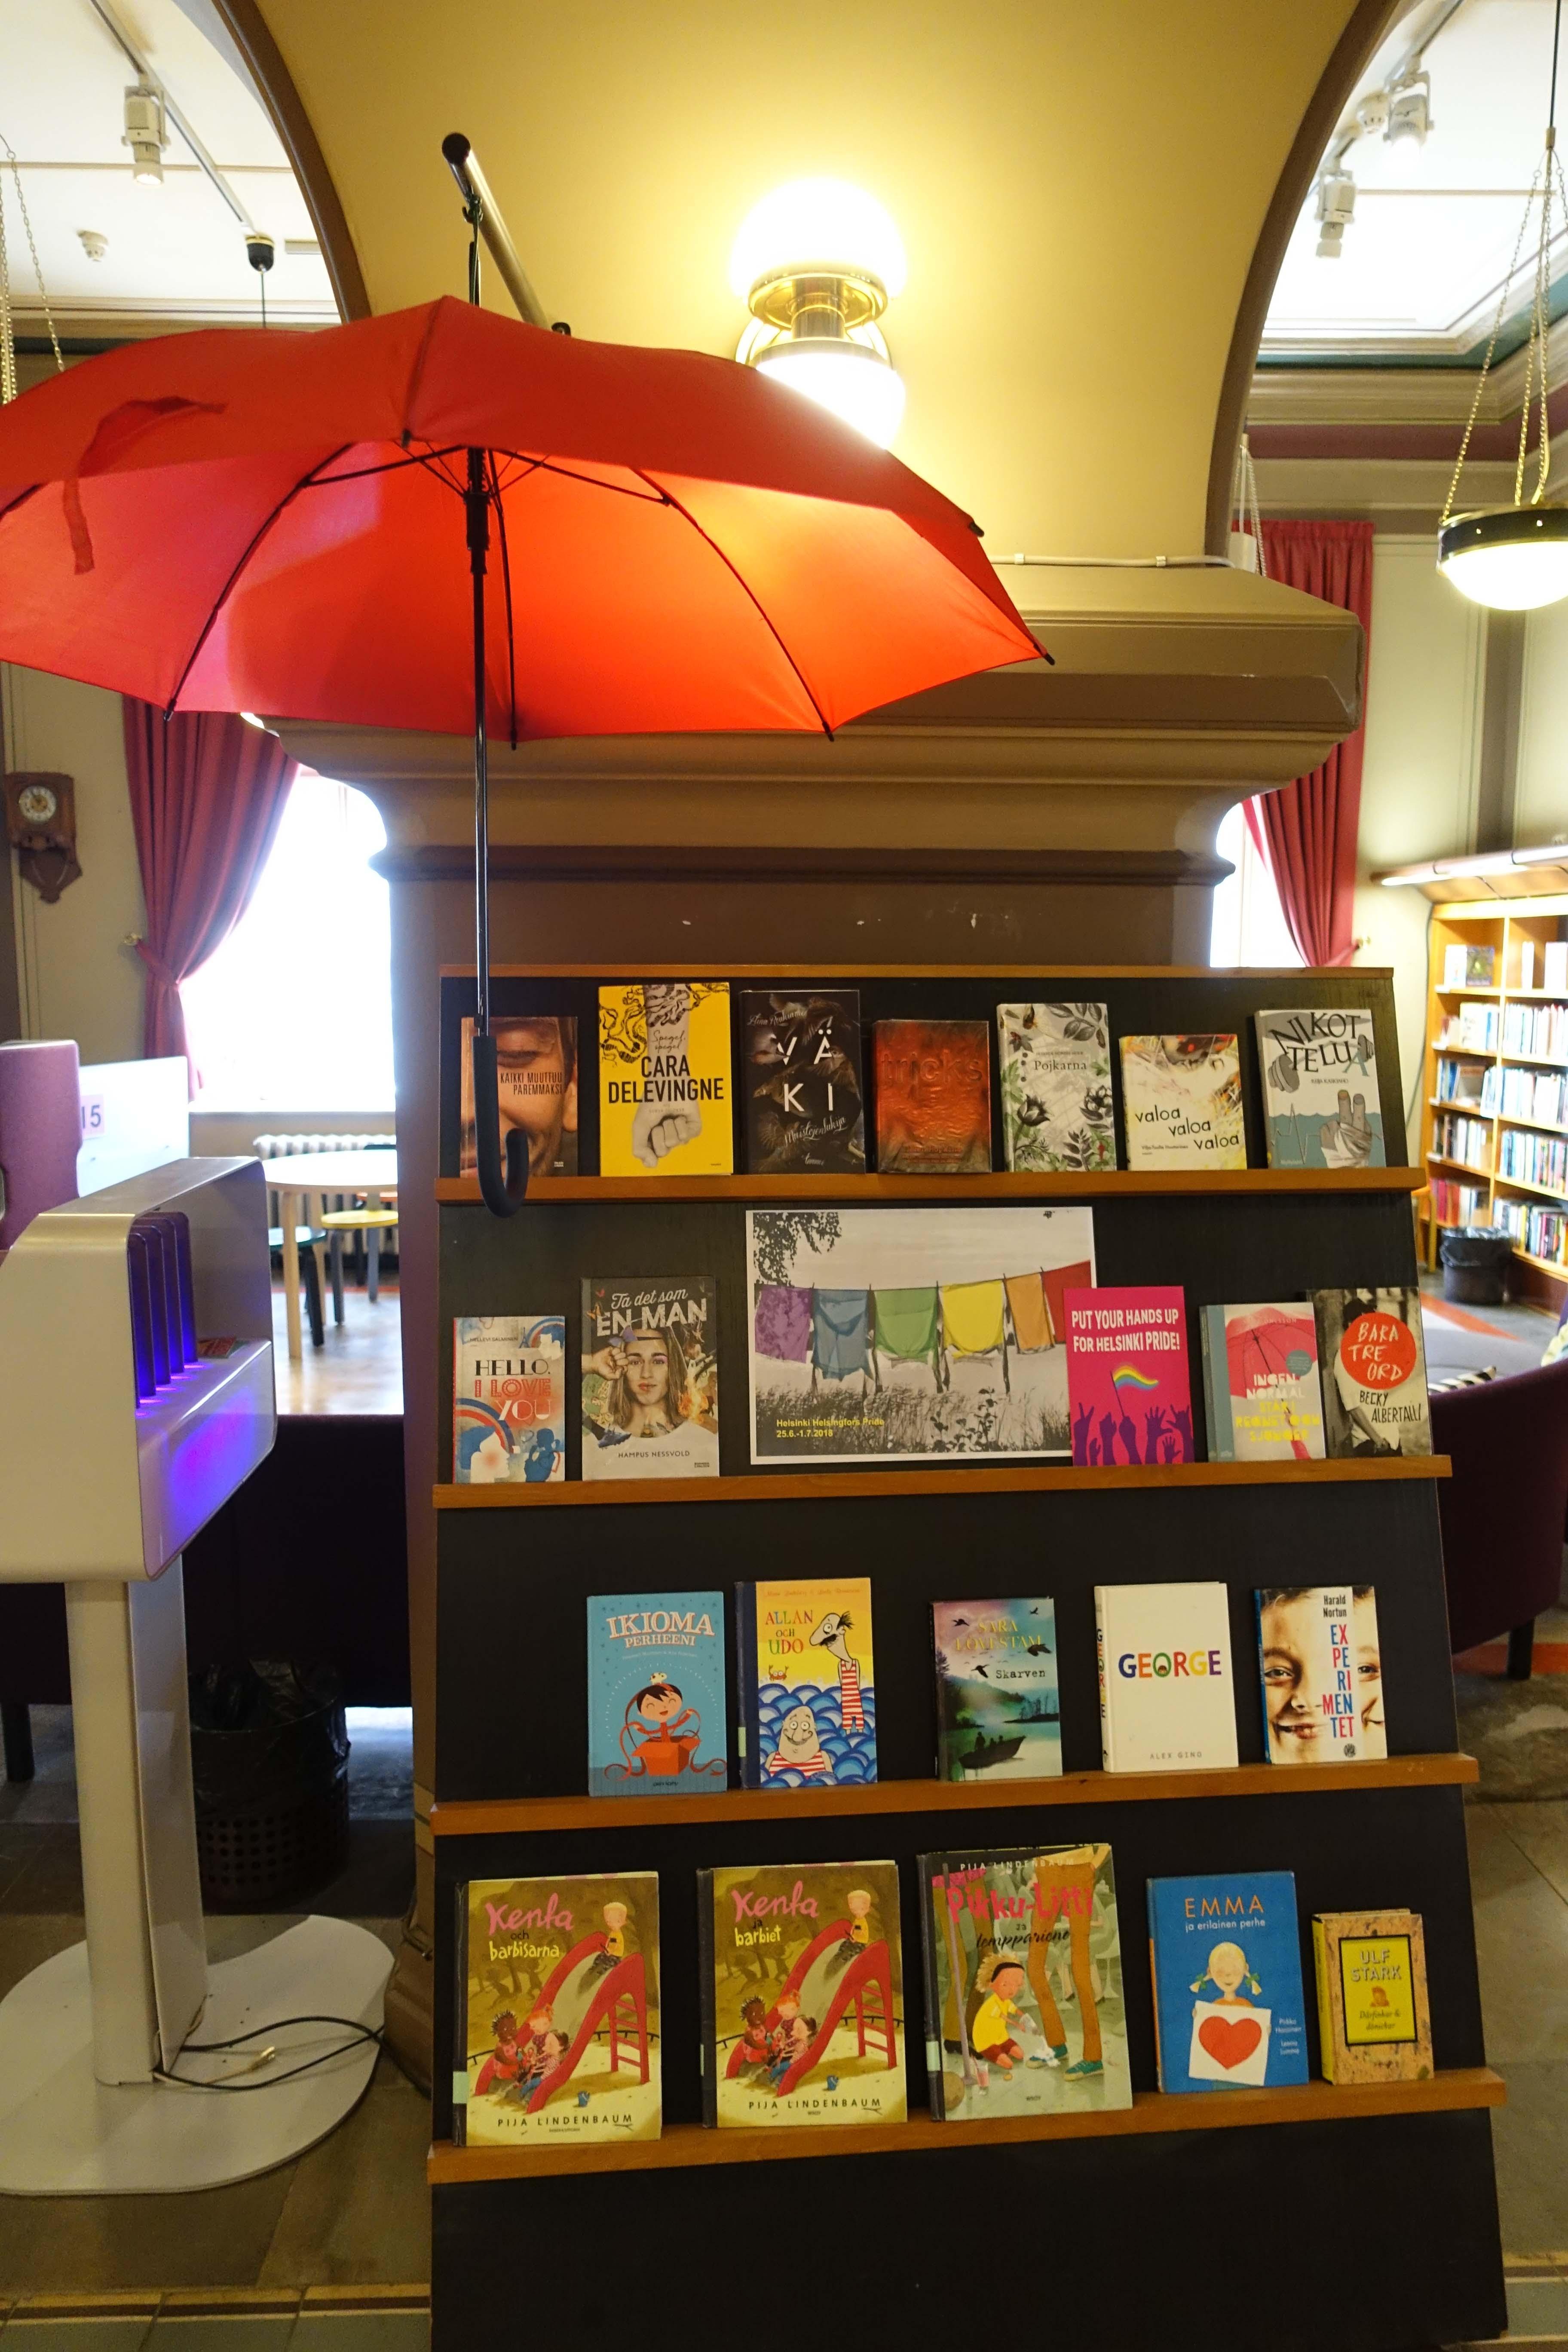 Finland's Kallio Public Library